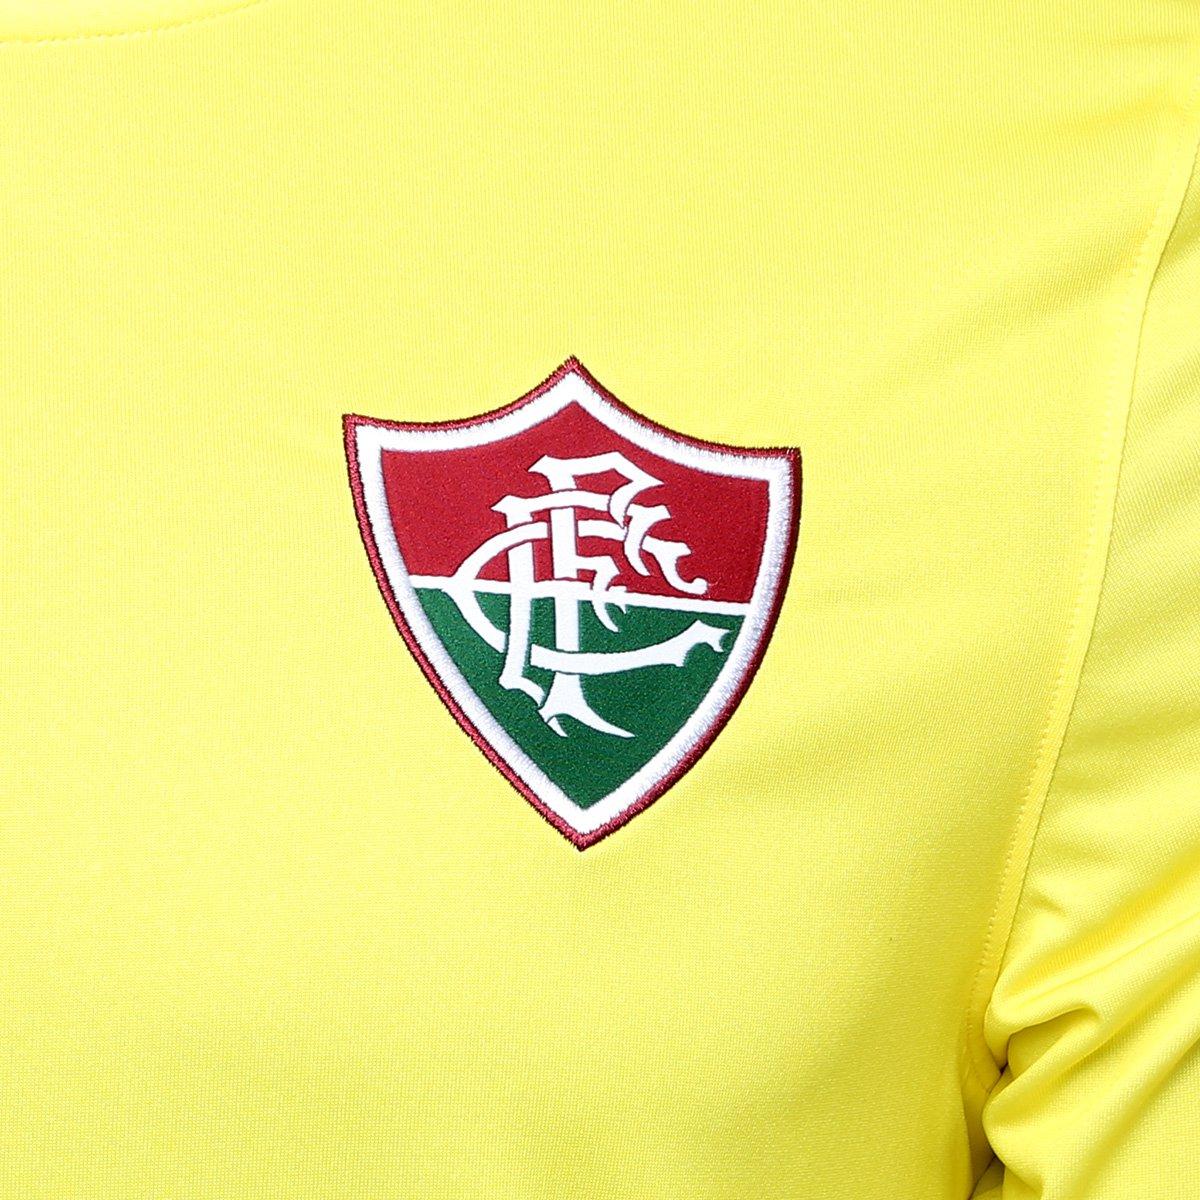 ... Camisa Fluminense I 17 18 s nº Torcedor Under Armour Masculina ... bc6ace11d391e